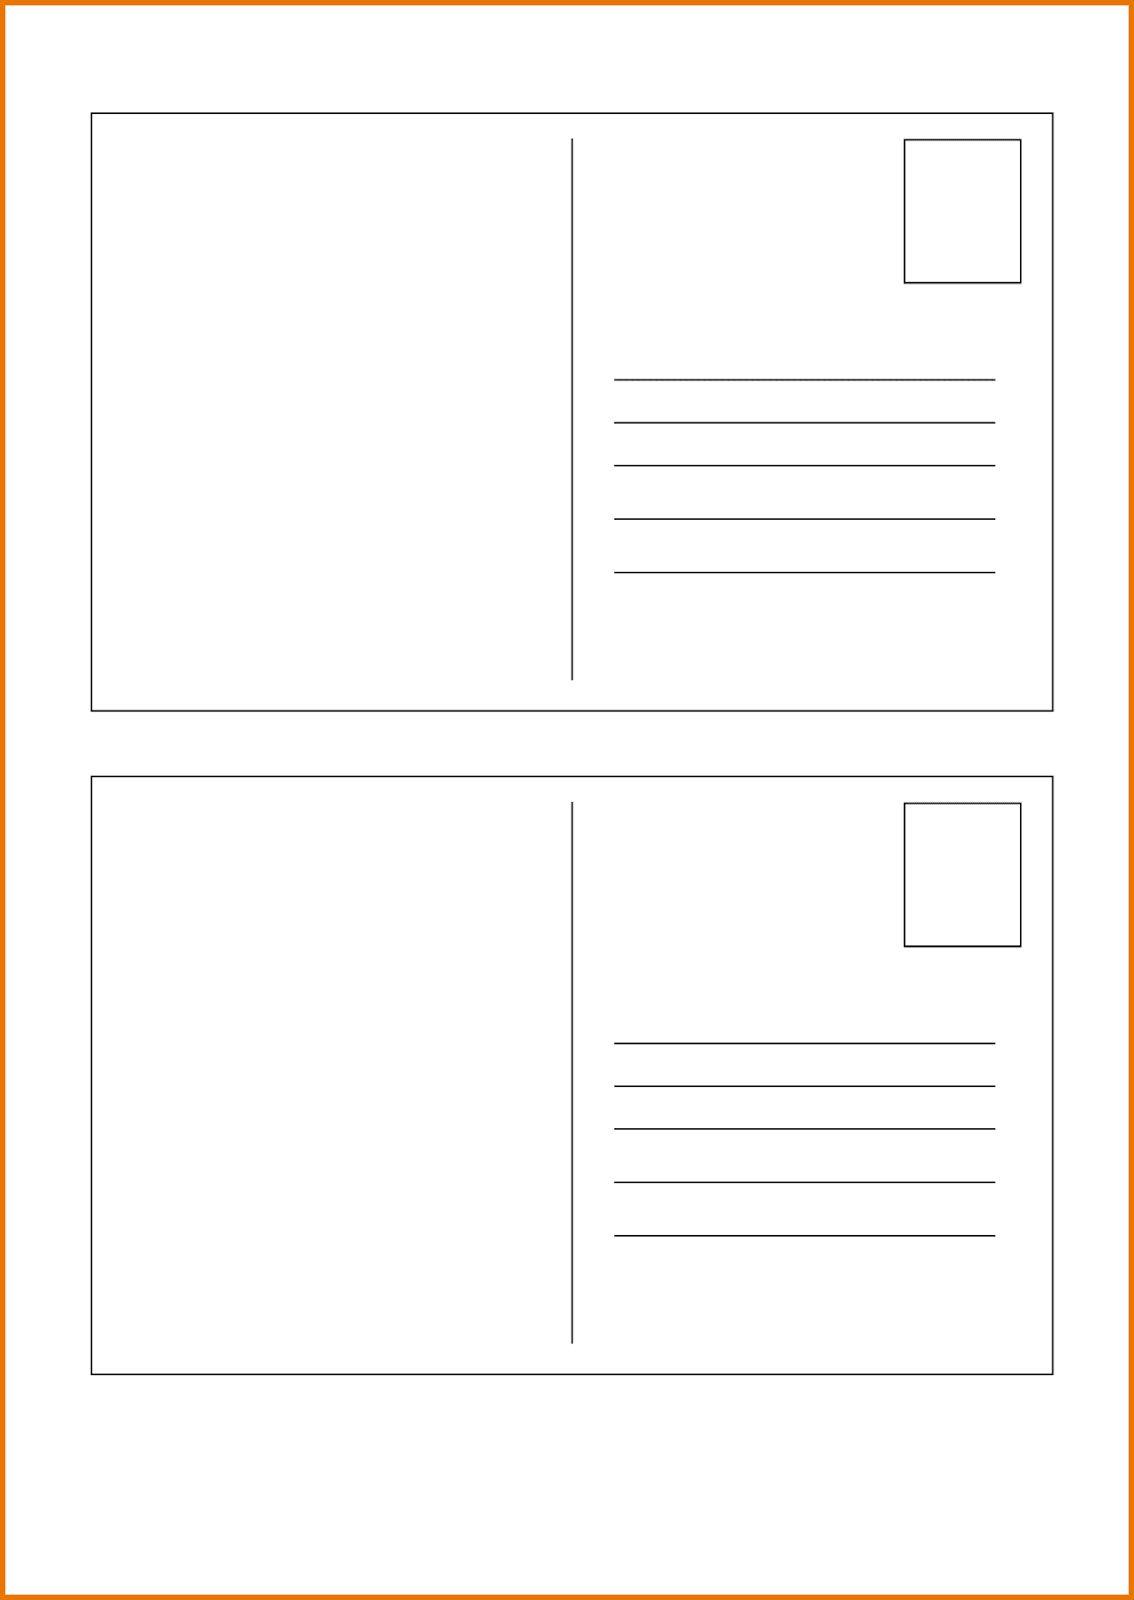 The Marvellous Free Printable Postcard Templates Pertaining To Microsoft Word 4x6 Postcard Templat Printable Postcards Postcard Template Postcard Template Free